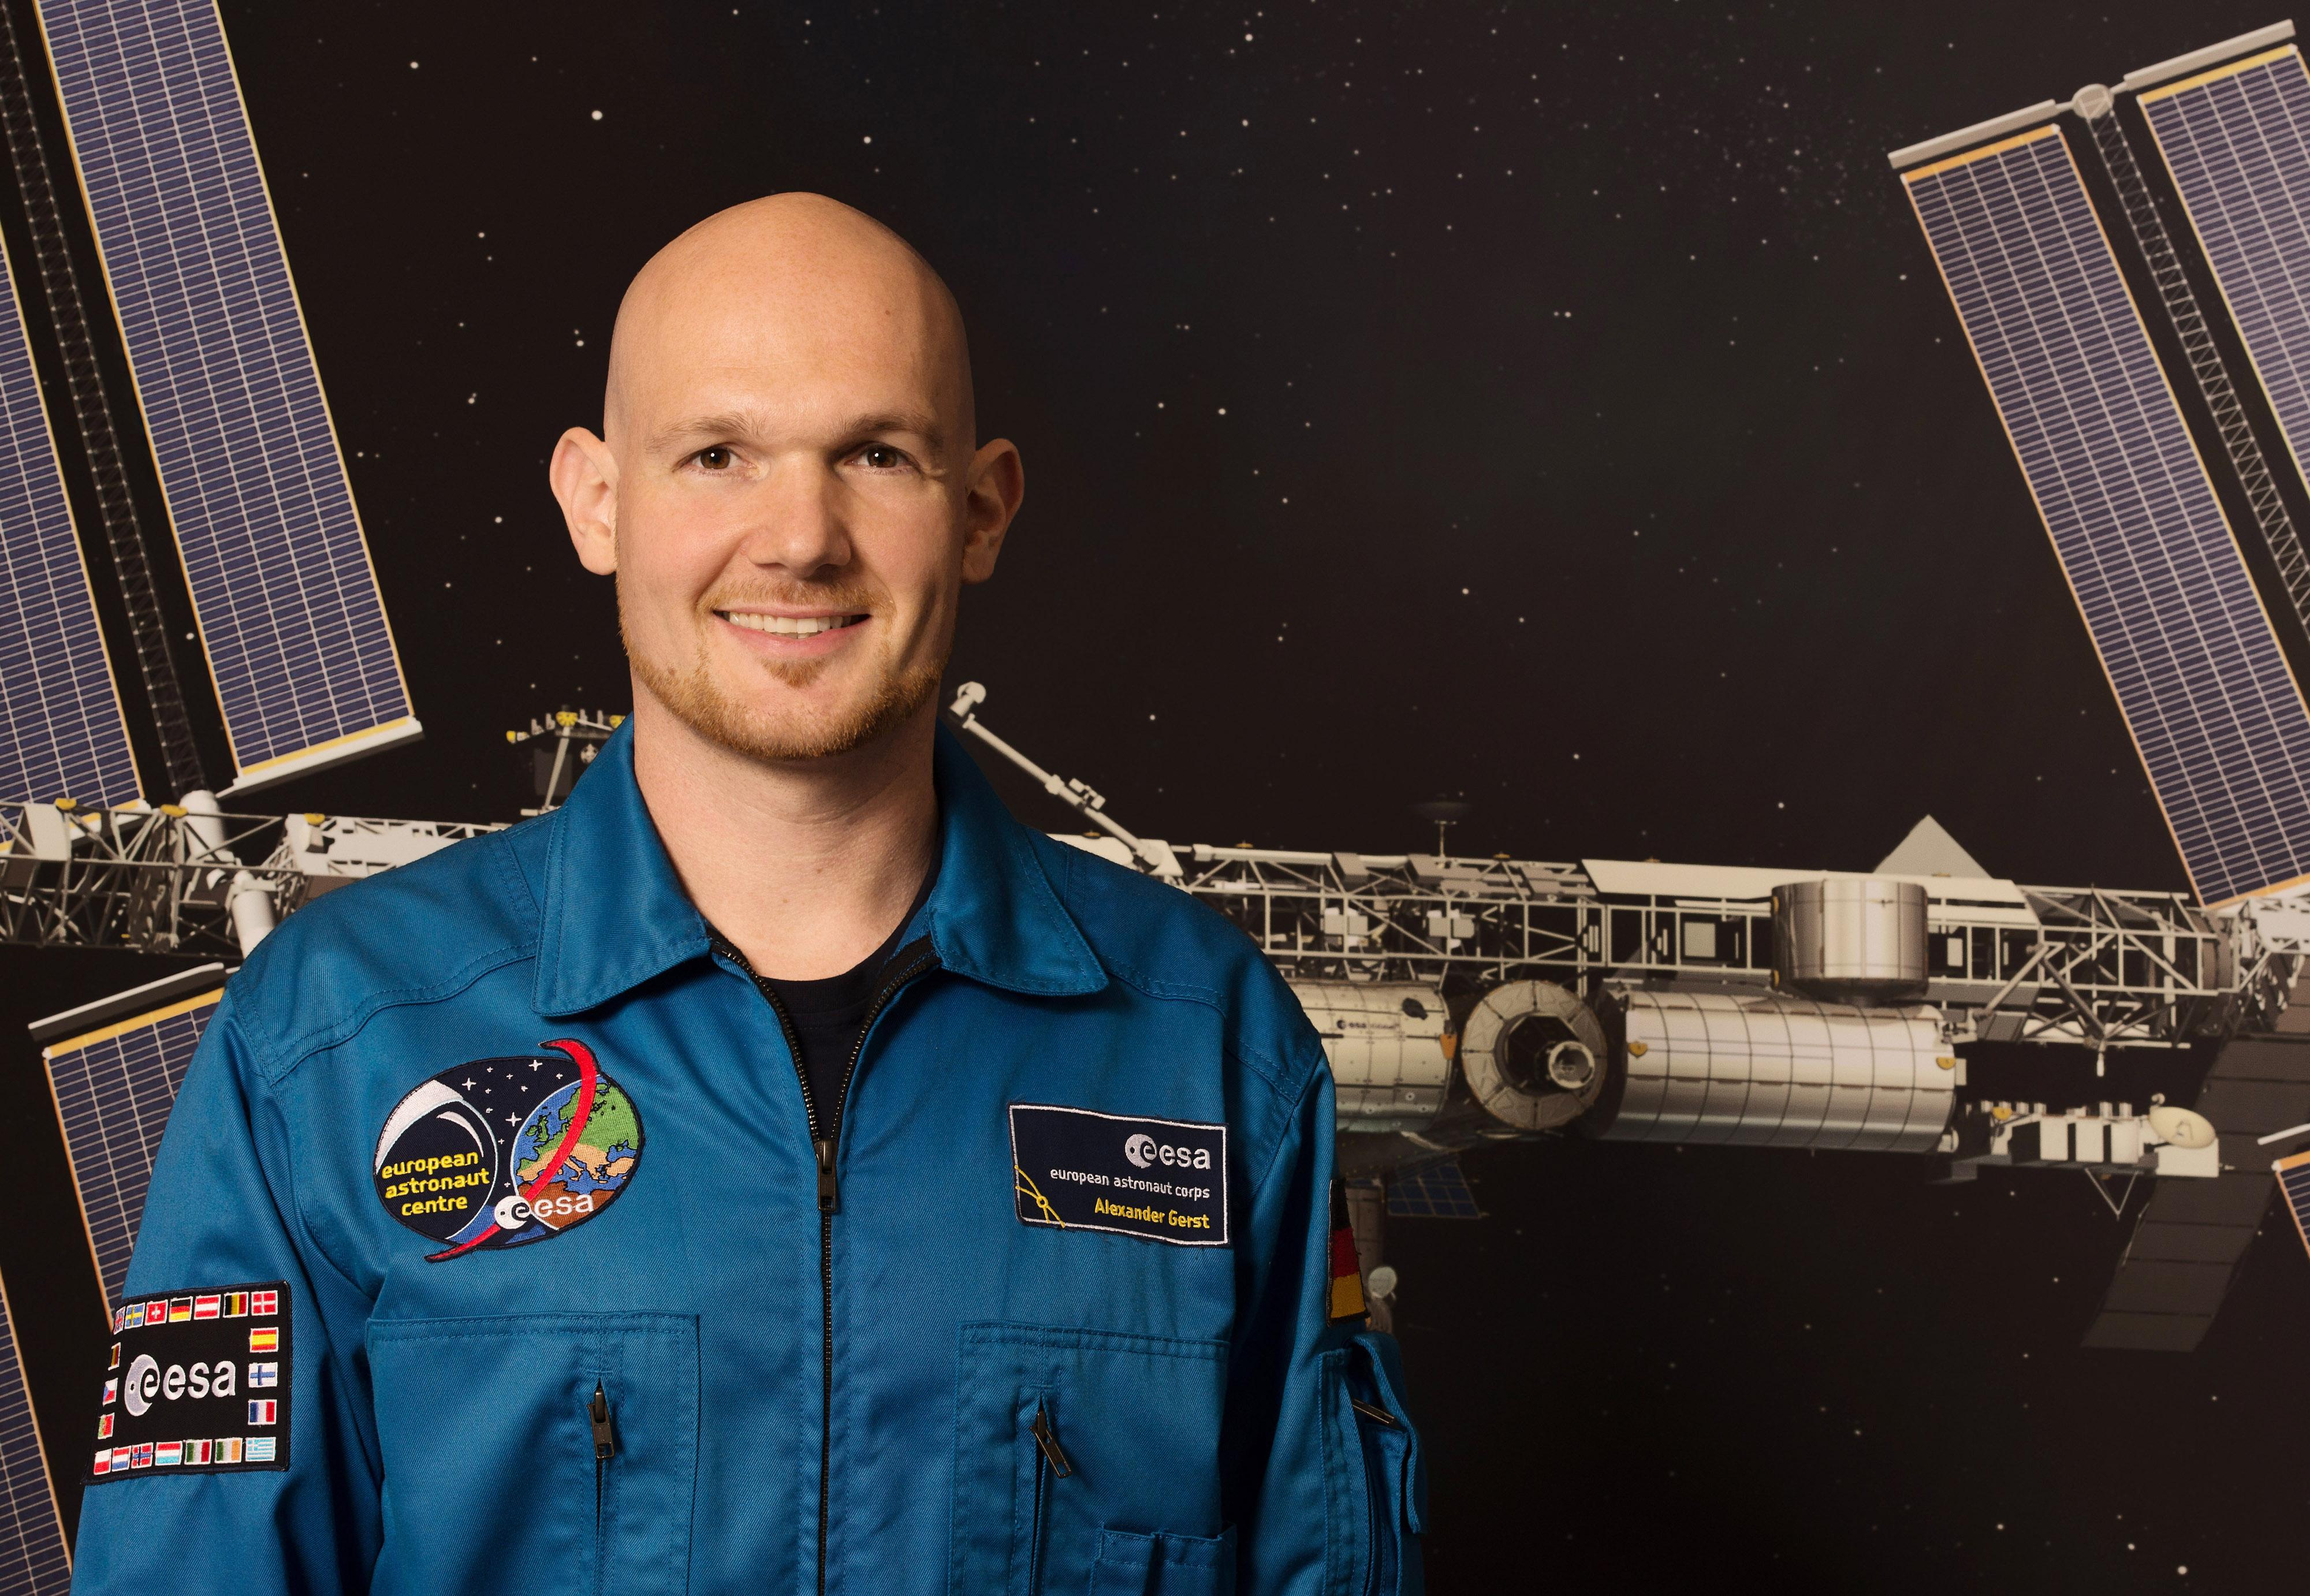 astronaut european space agency - photo #26